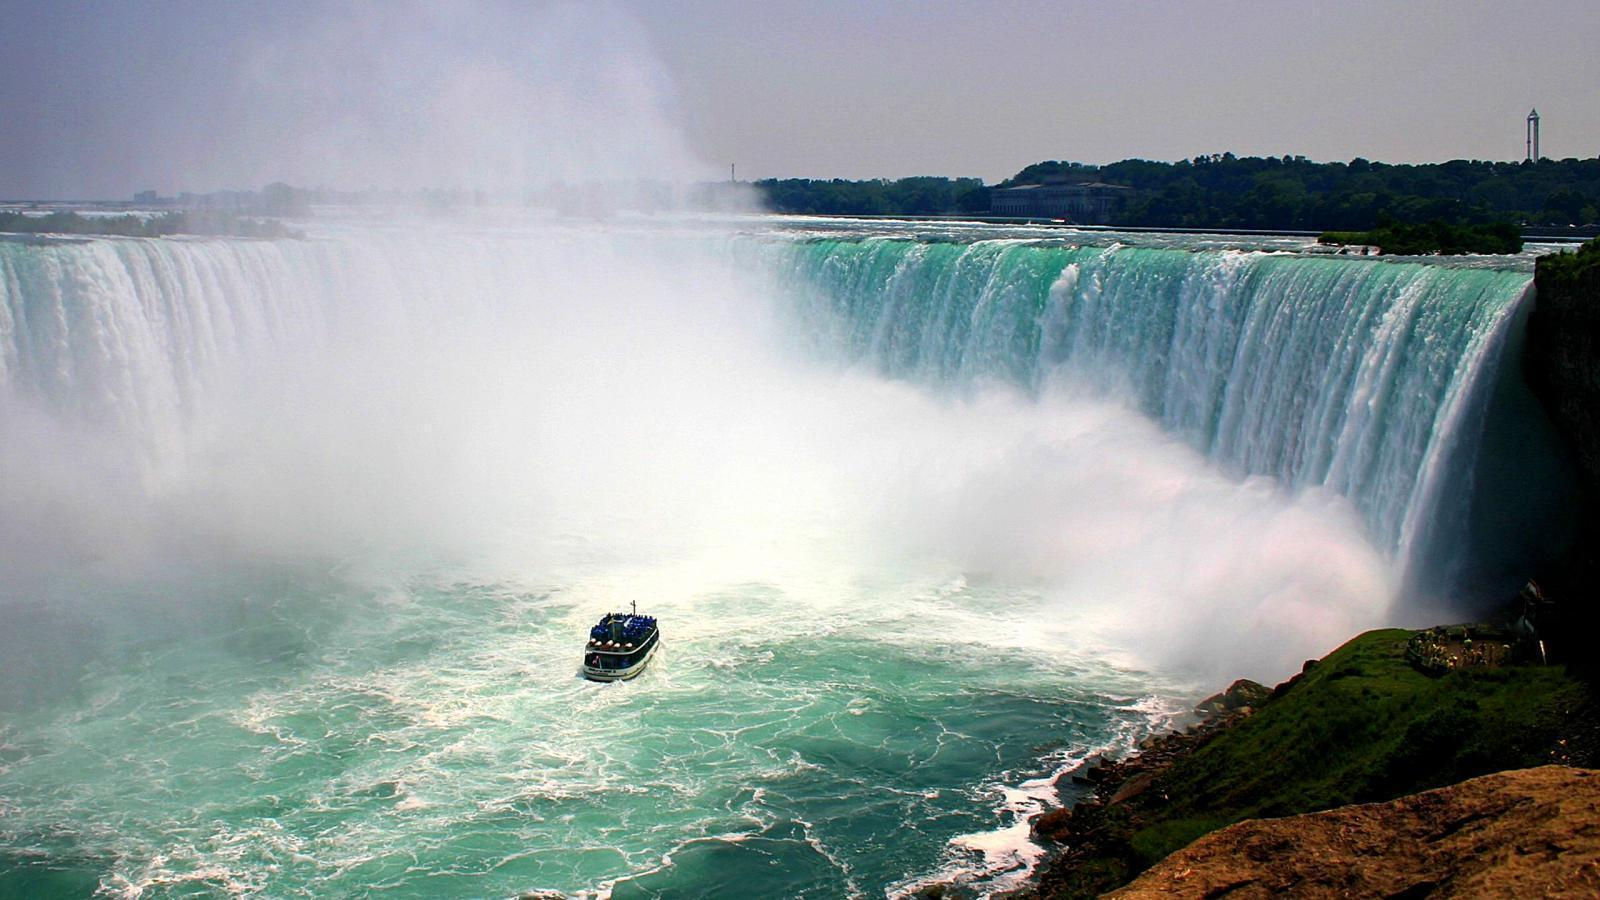 Niagara Falls Wallpapers Wallpaper Cave